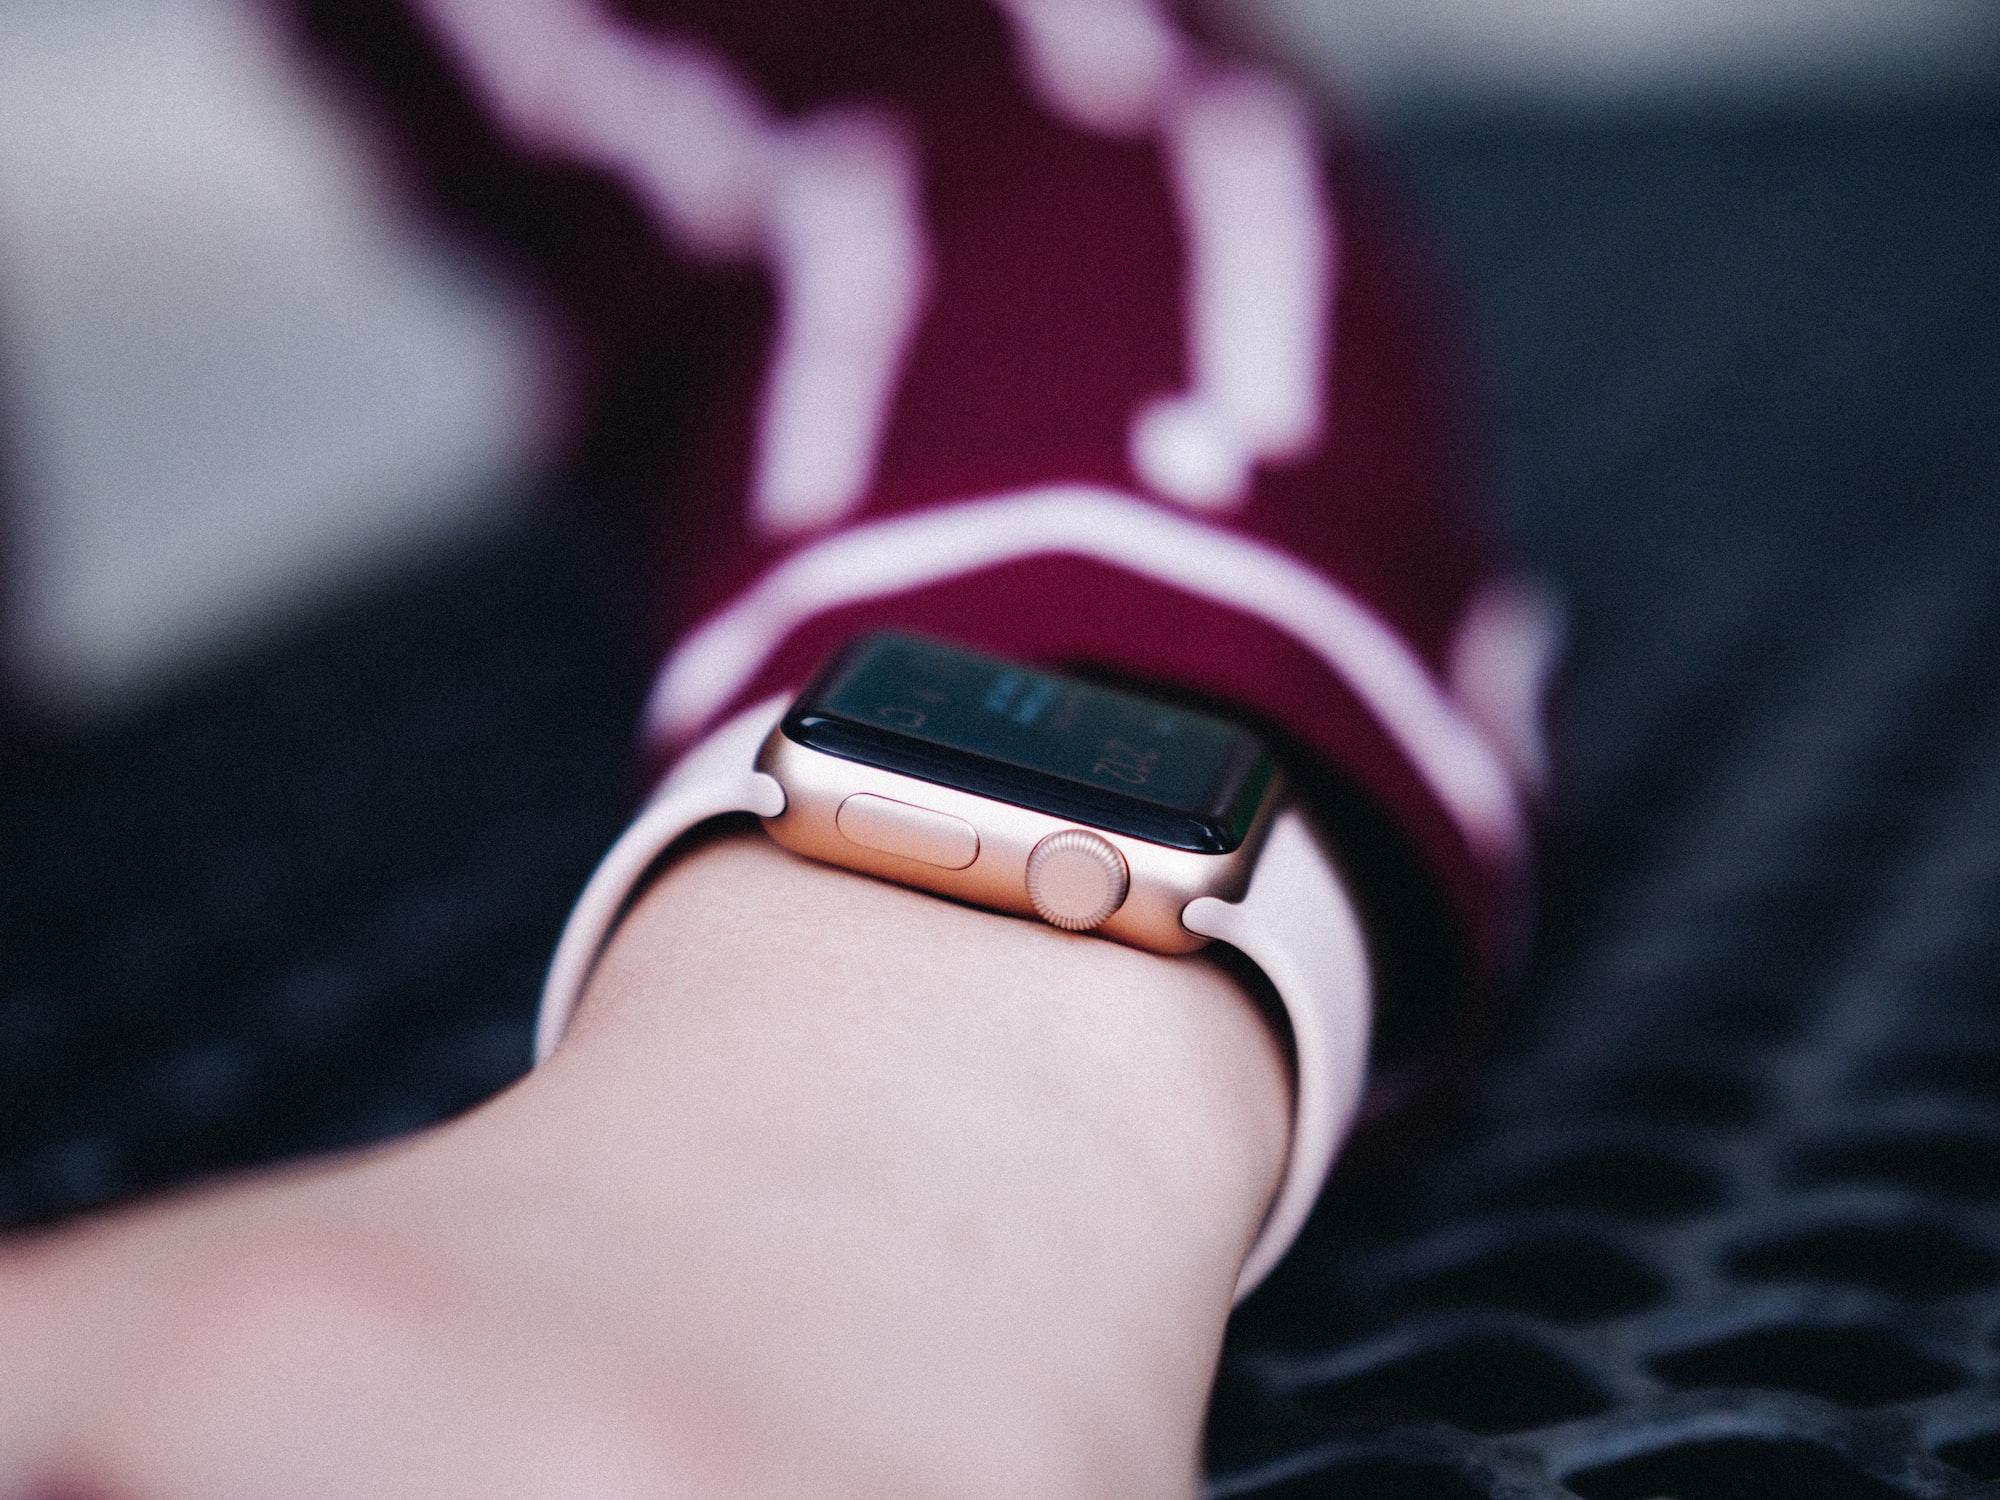 watchOS 7.3.1 lançado exclusivamente para Apple Watches Series 5 e SE